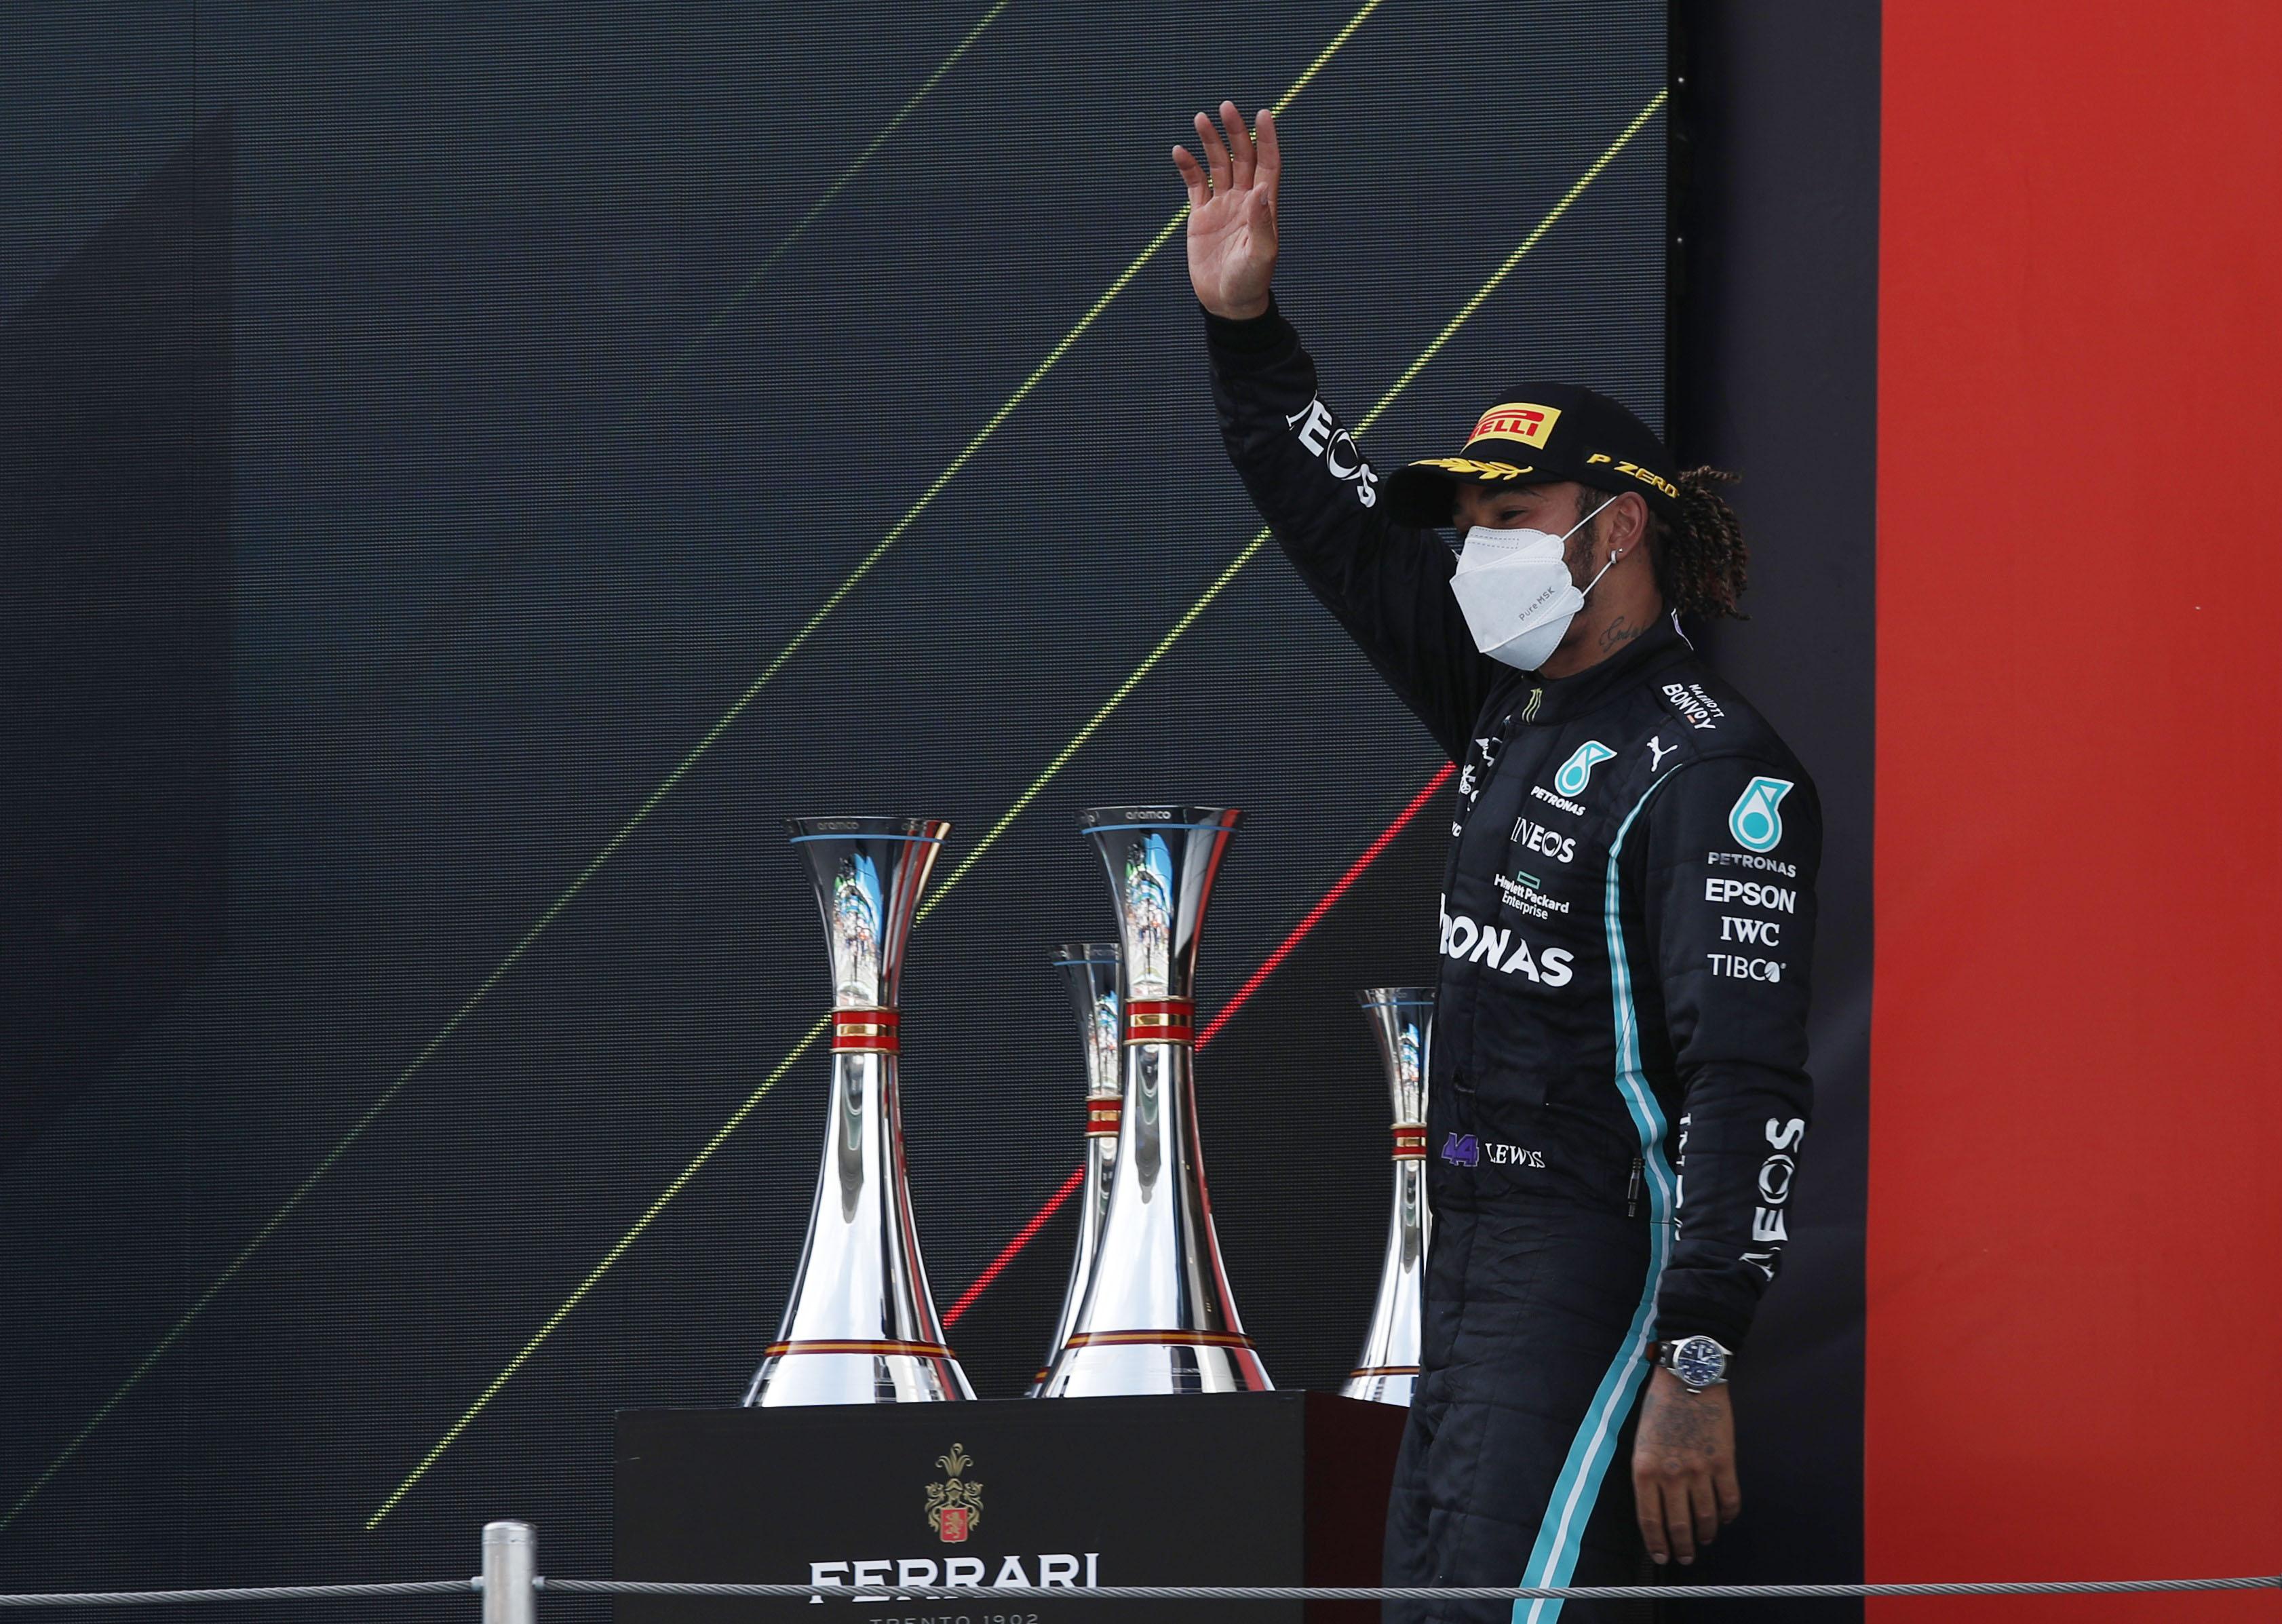 Formula One F1 - Spanish Grand Prix - Circuit de Barcelona-Catalunya, Barcelona, Spain - May 9, 2021 Mercedes' Lewis Hamilton celebrates on the podium after winning the race REUTERS/Albert Gea